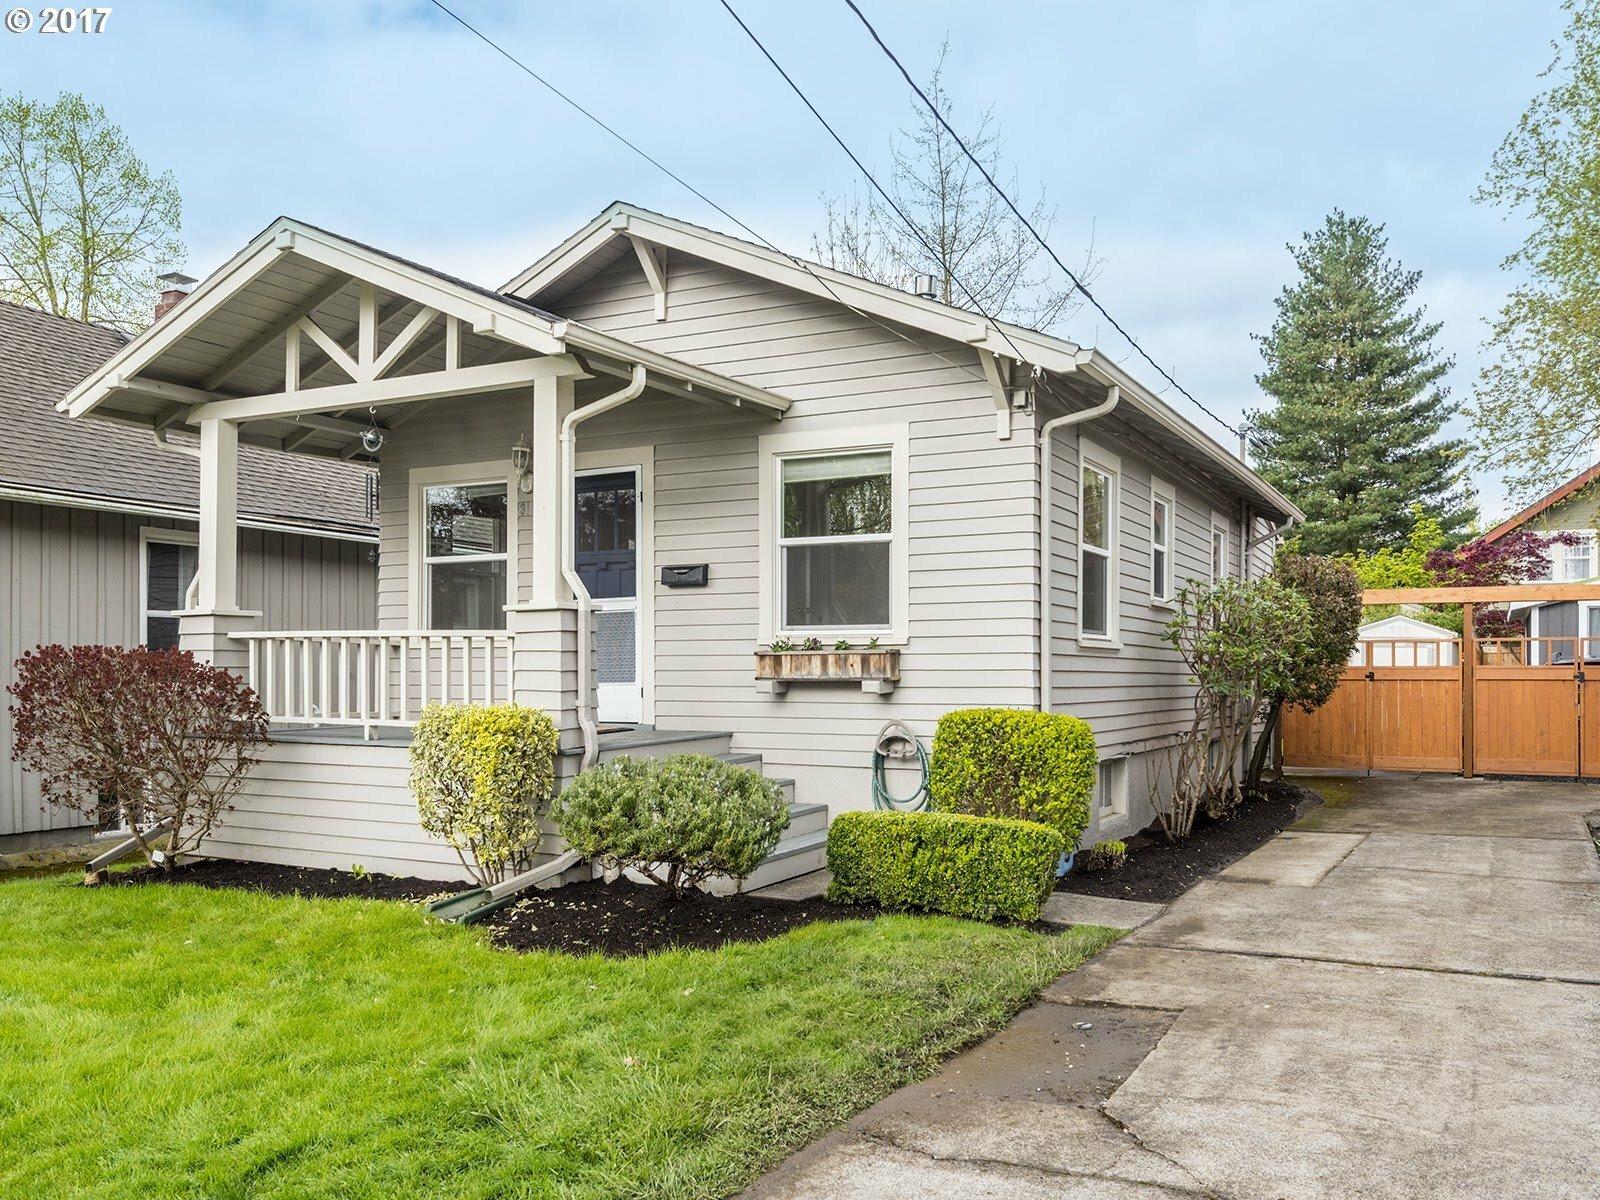 3111 Ne 31st Ave, Portland, OR - USA (photo 1)